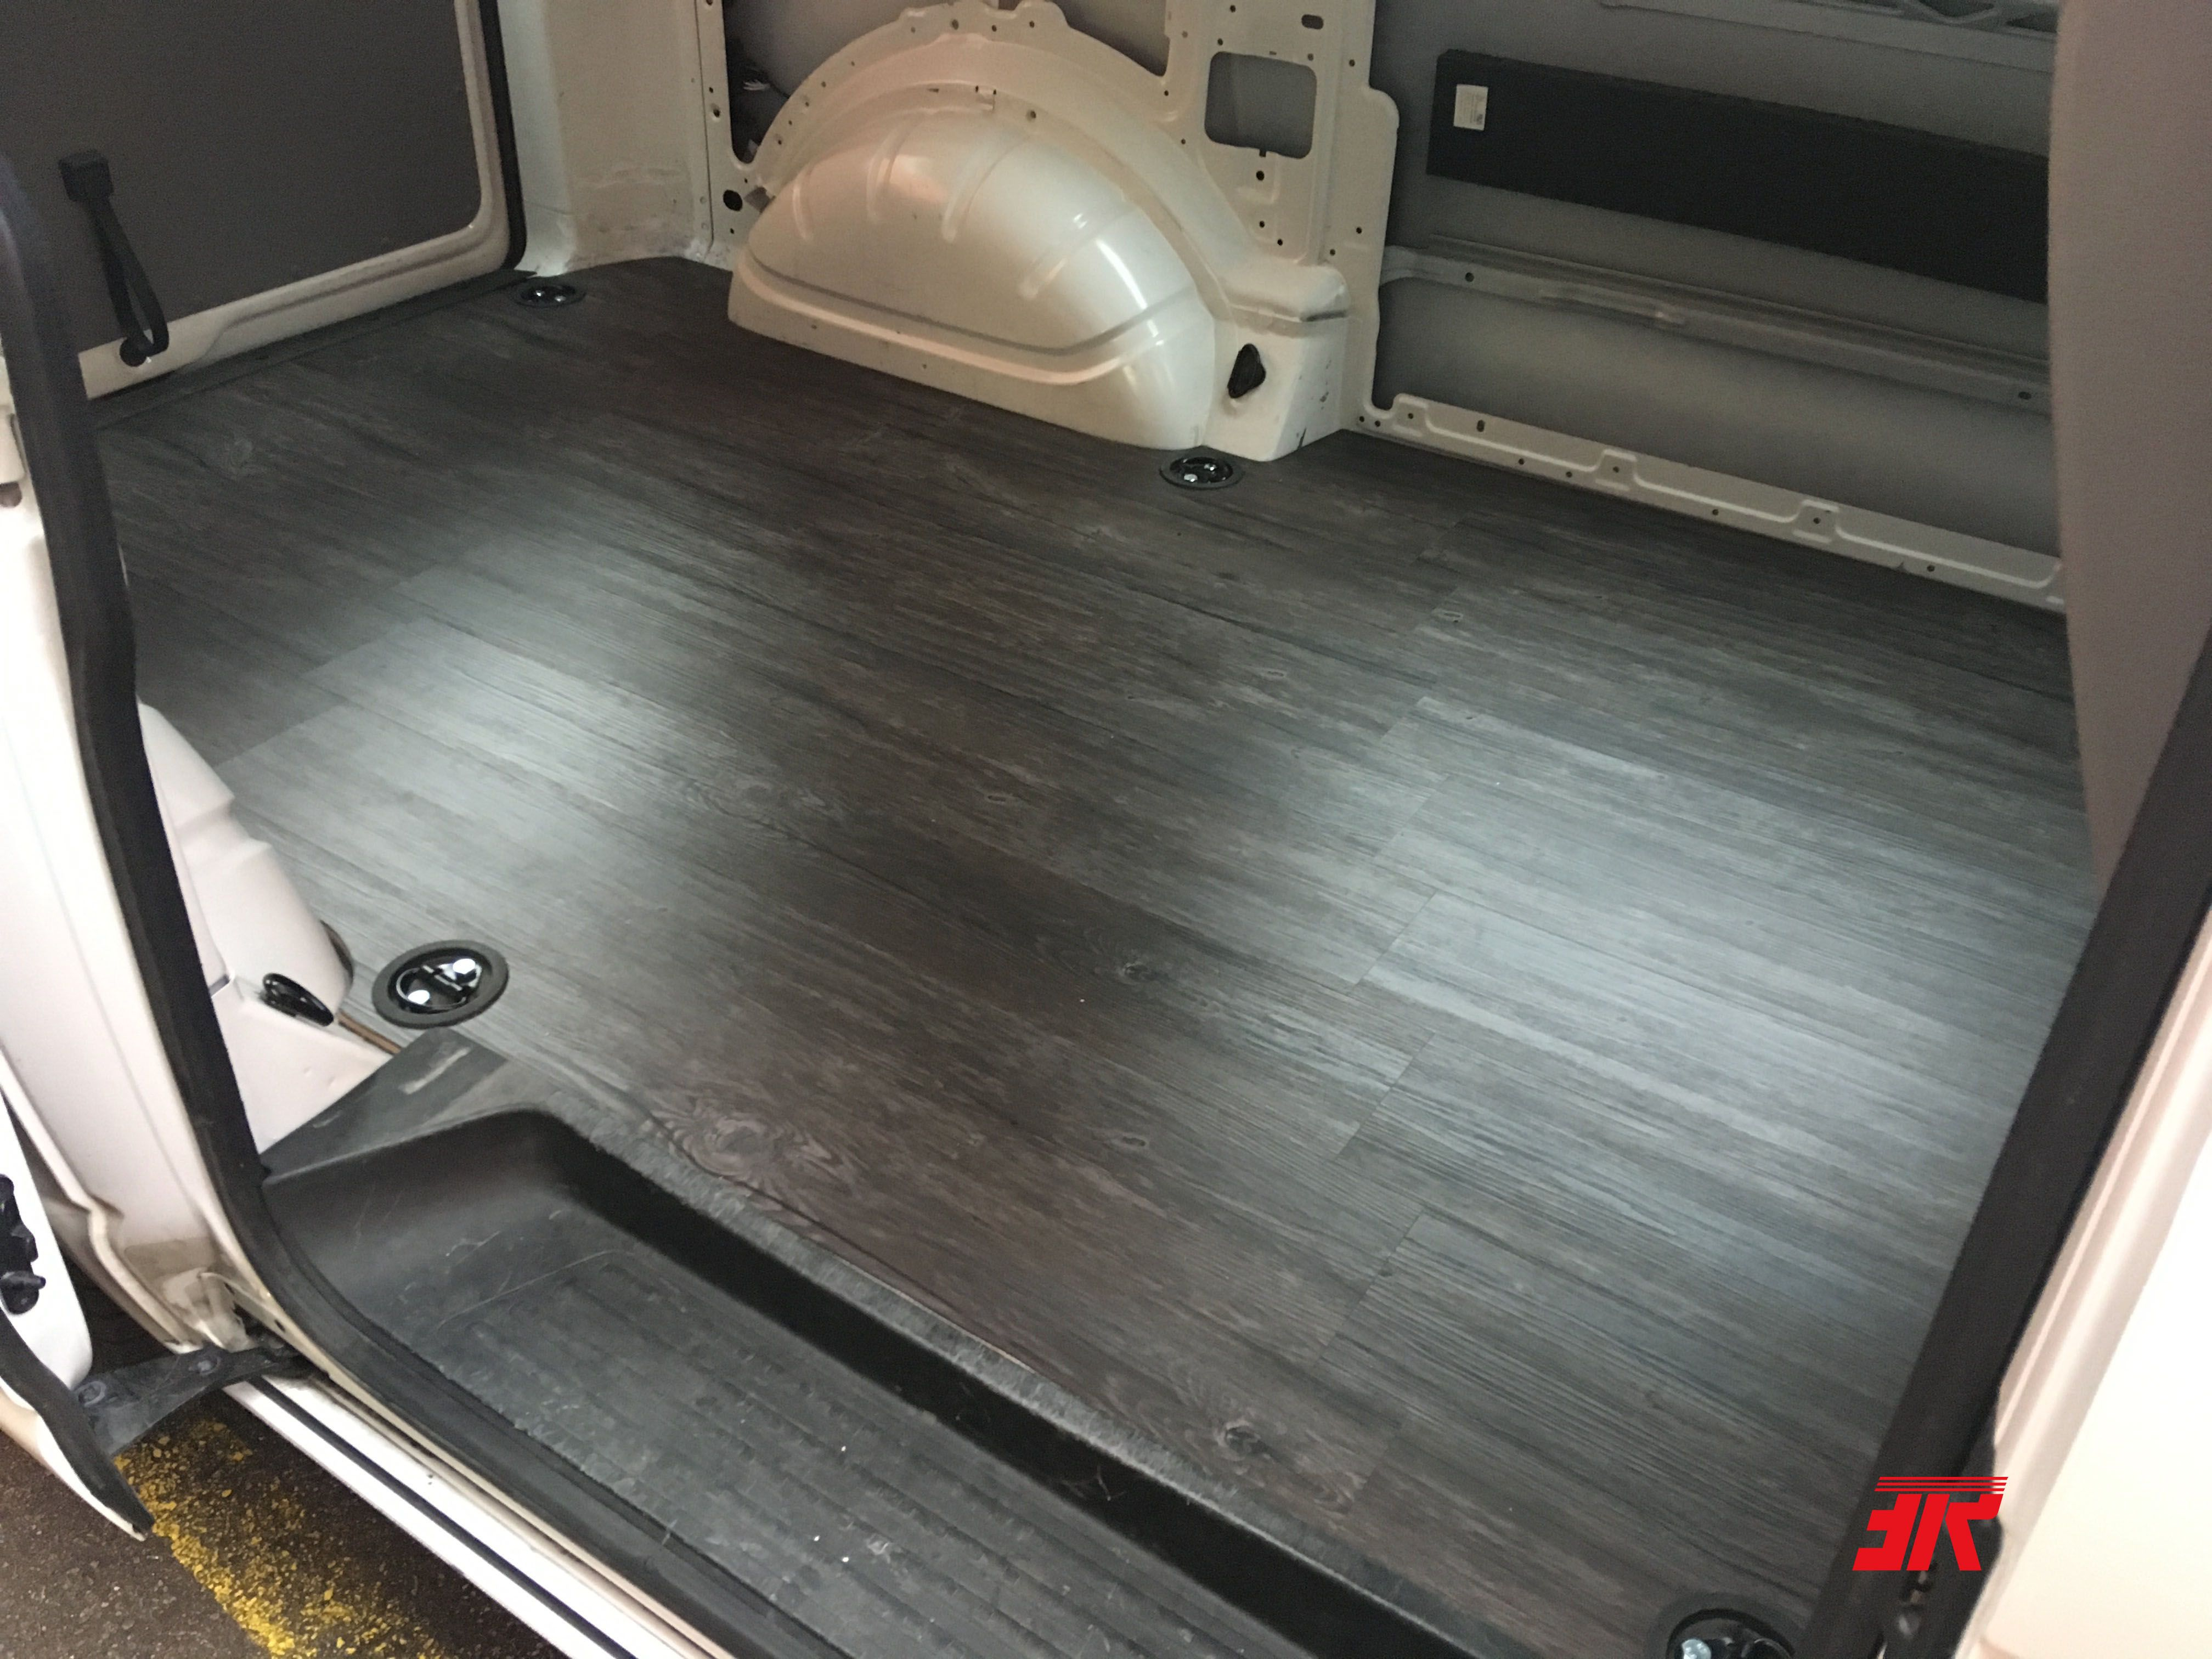 Vw T5 Vom Transporter Zum Wohnmobil Laderaum Boden Mit Vinyl Laminat Verbaut Campingbus Ausbau Vinyl Laminat Vw T5